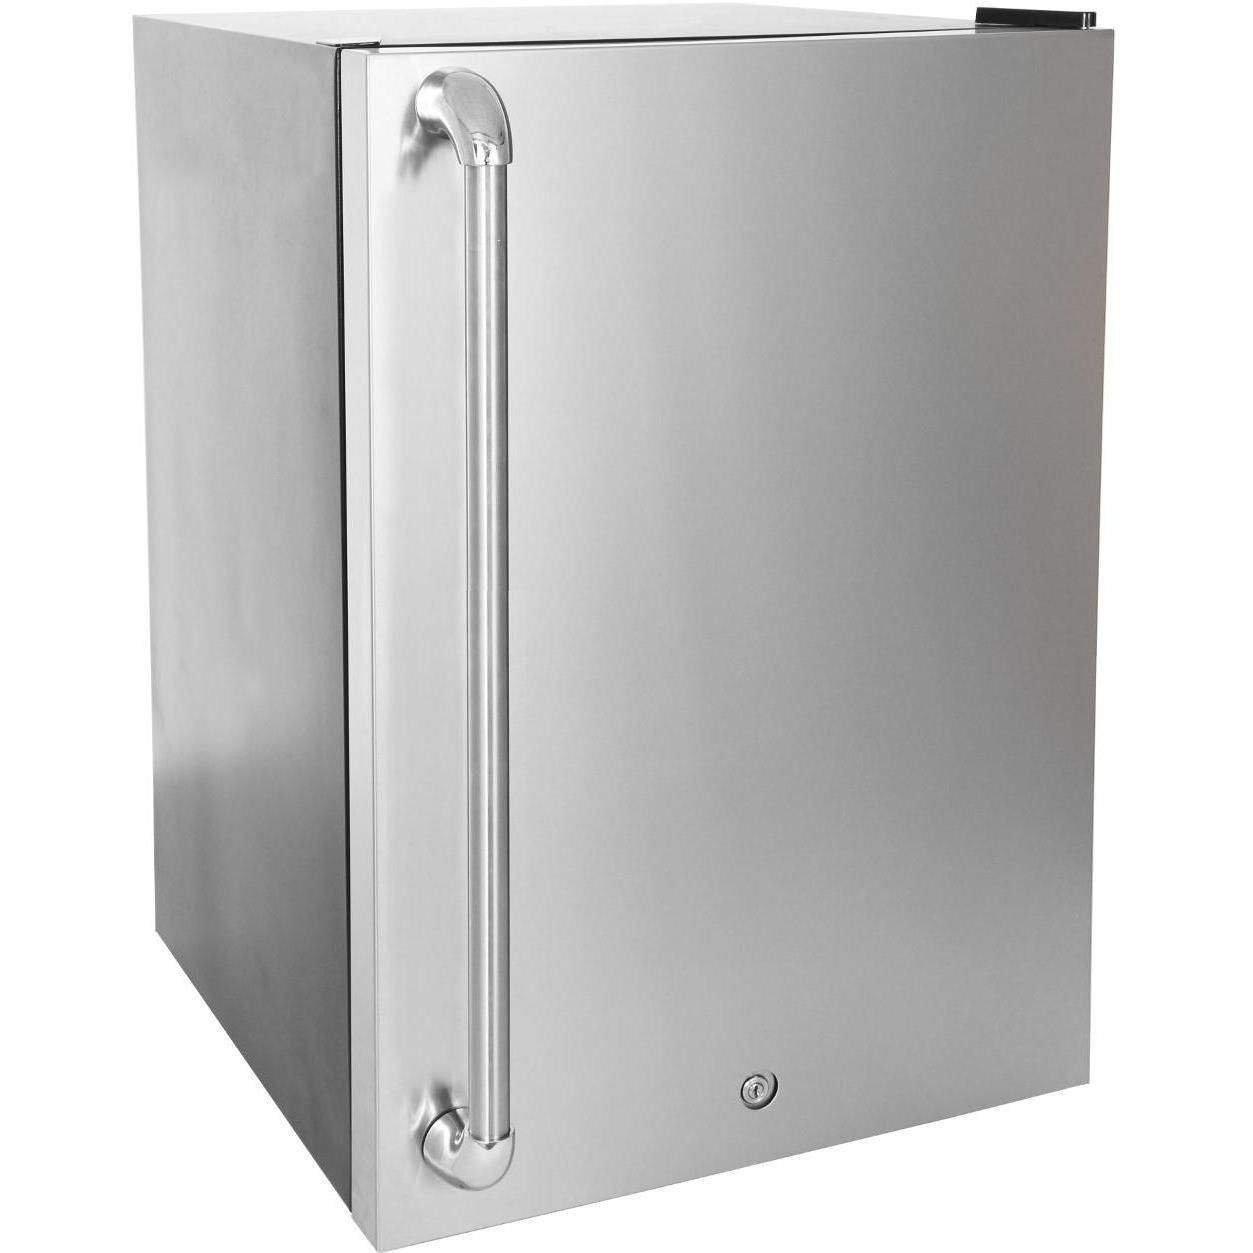 Blaze Stainless Front Door Upgrade 4.5 for Right Hinge (BLZ-SSRF130-BLZ-SSFP-4-5) by Blaze (Image #1)